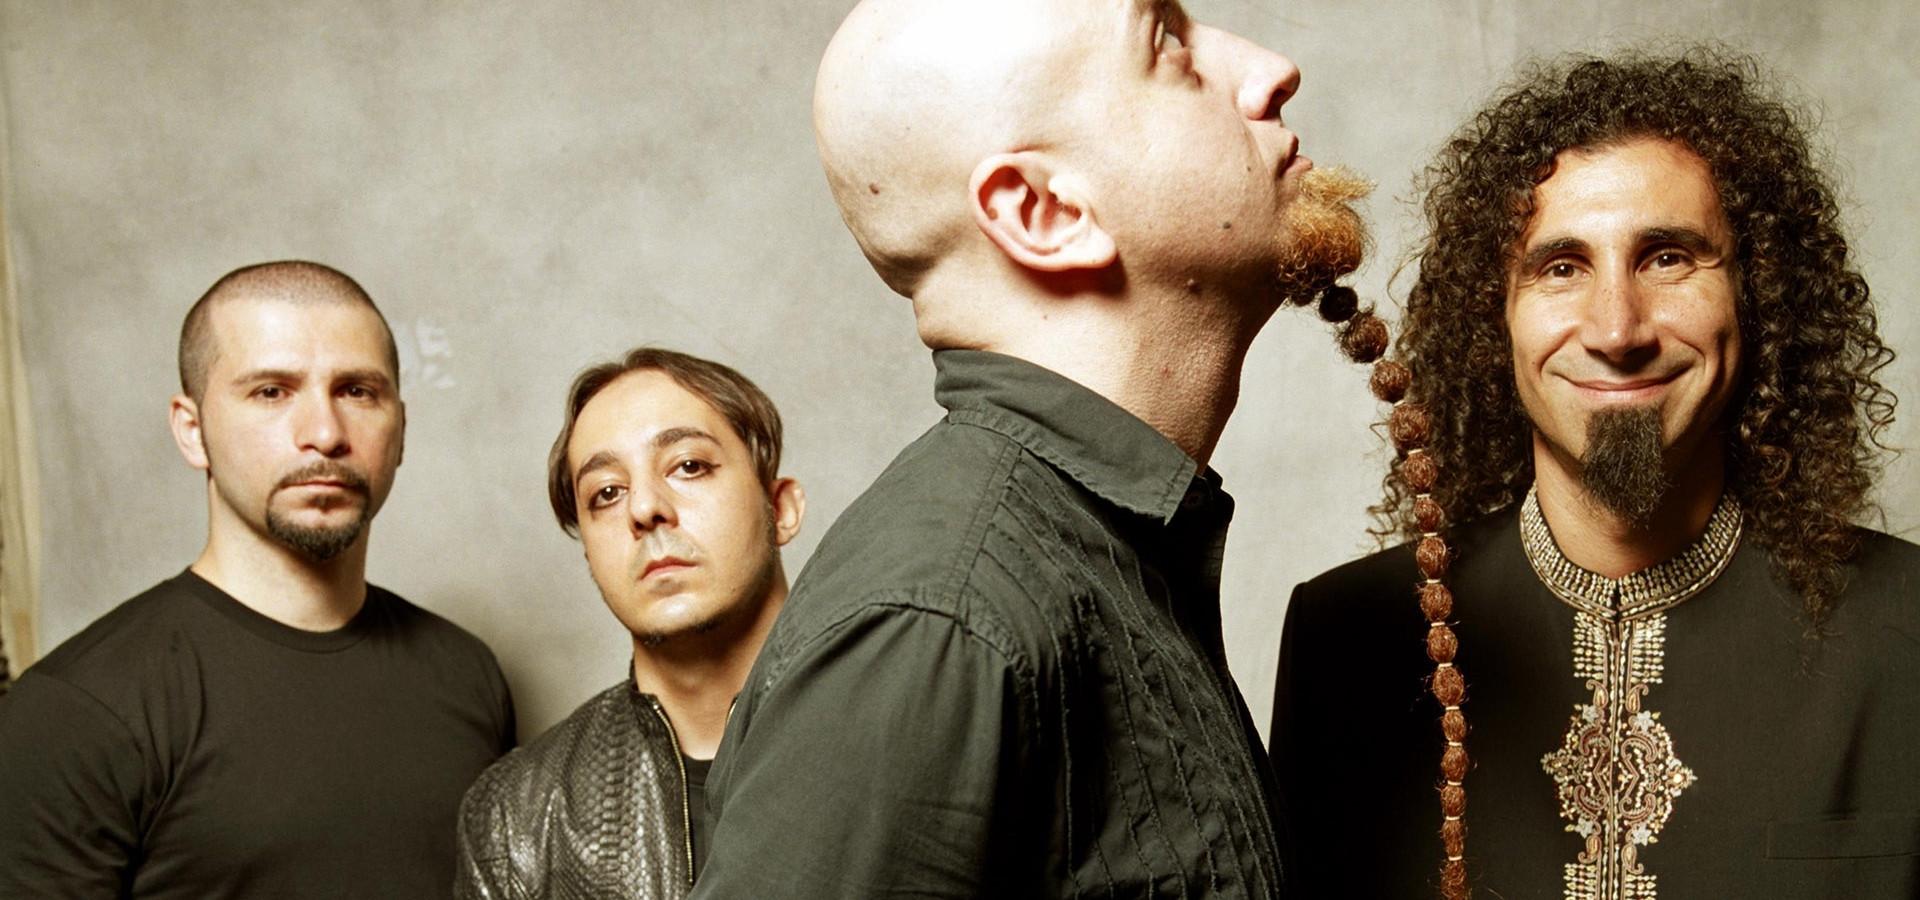 Simple Music Ensemble. System of a Down. Концерт на Хлебозаводе фото